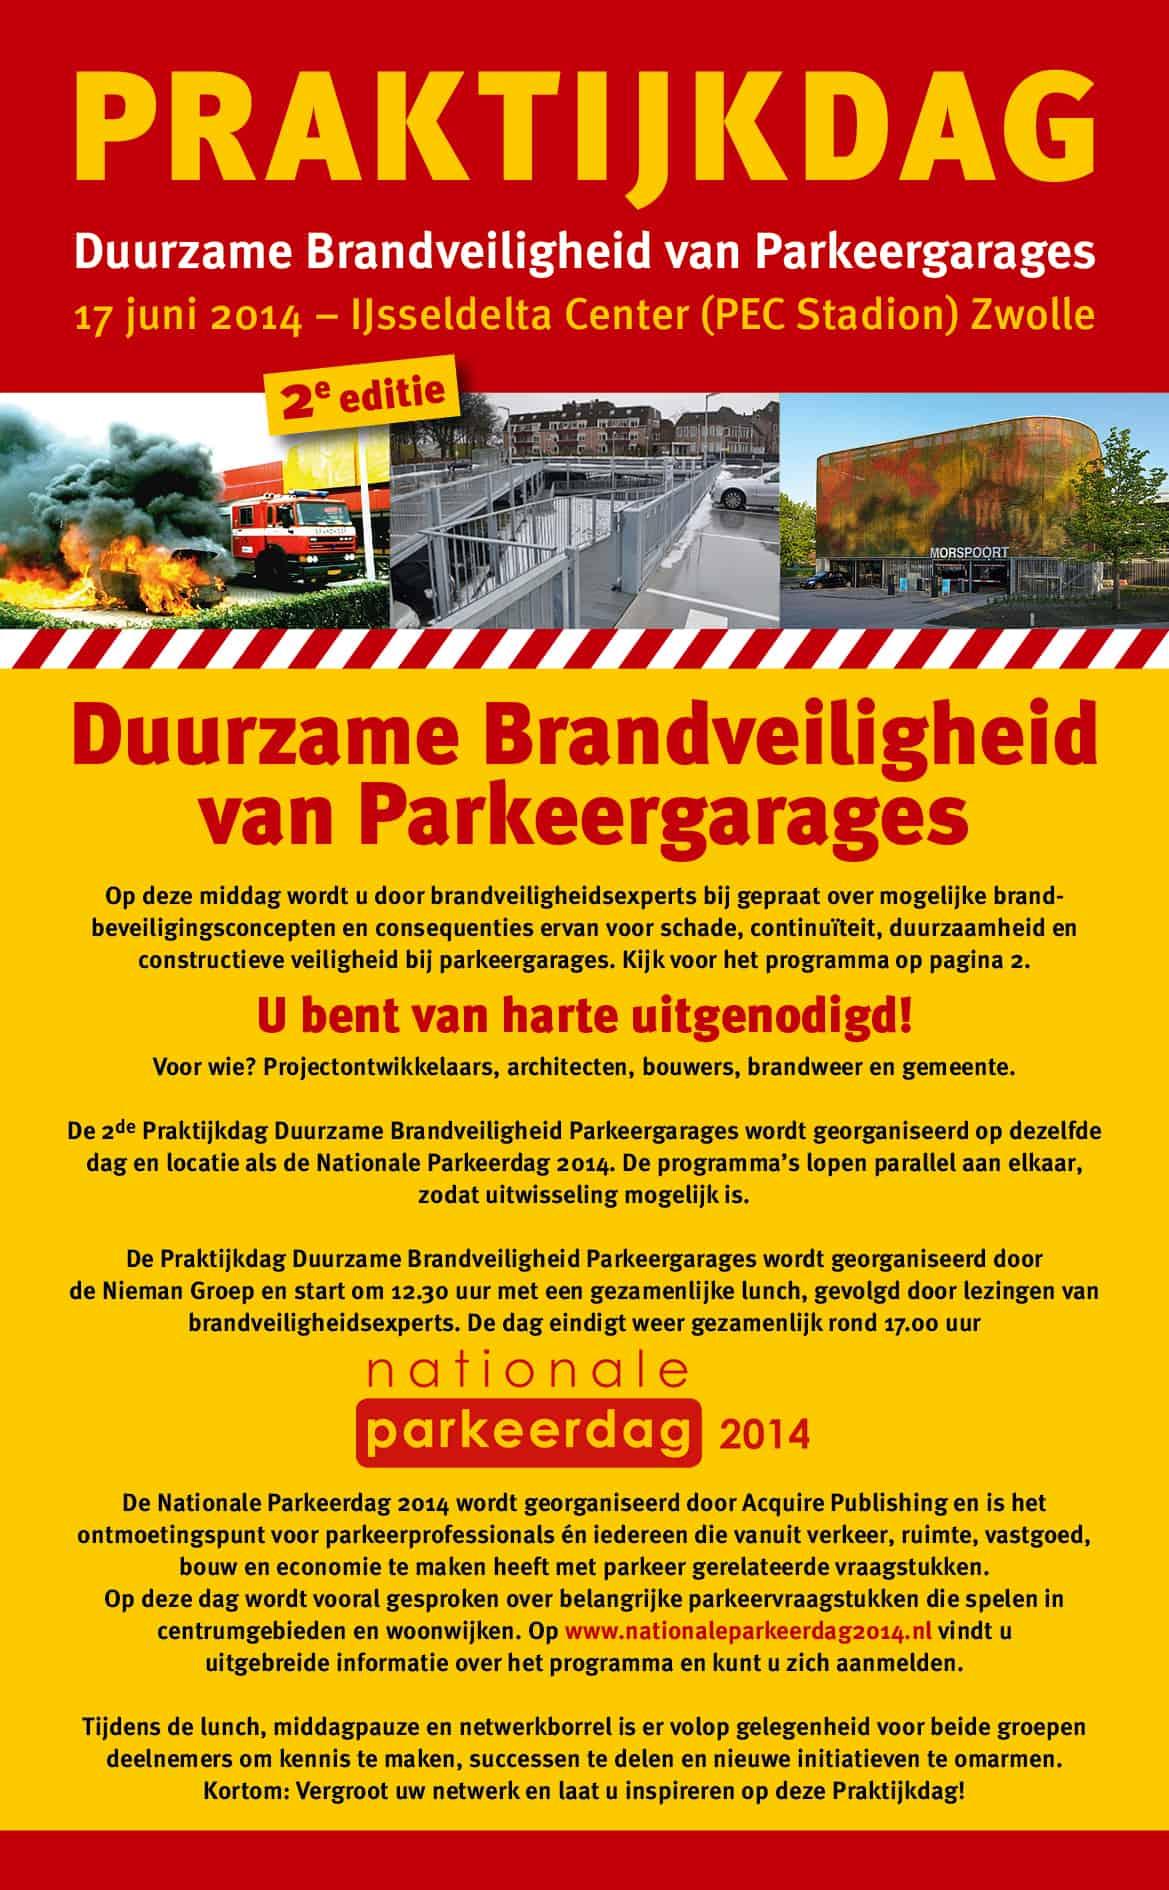 Flyer Praktijkdag Duurzame Brandveiligheid van Parkeergarages pag 1